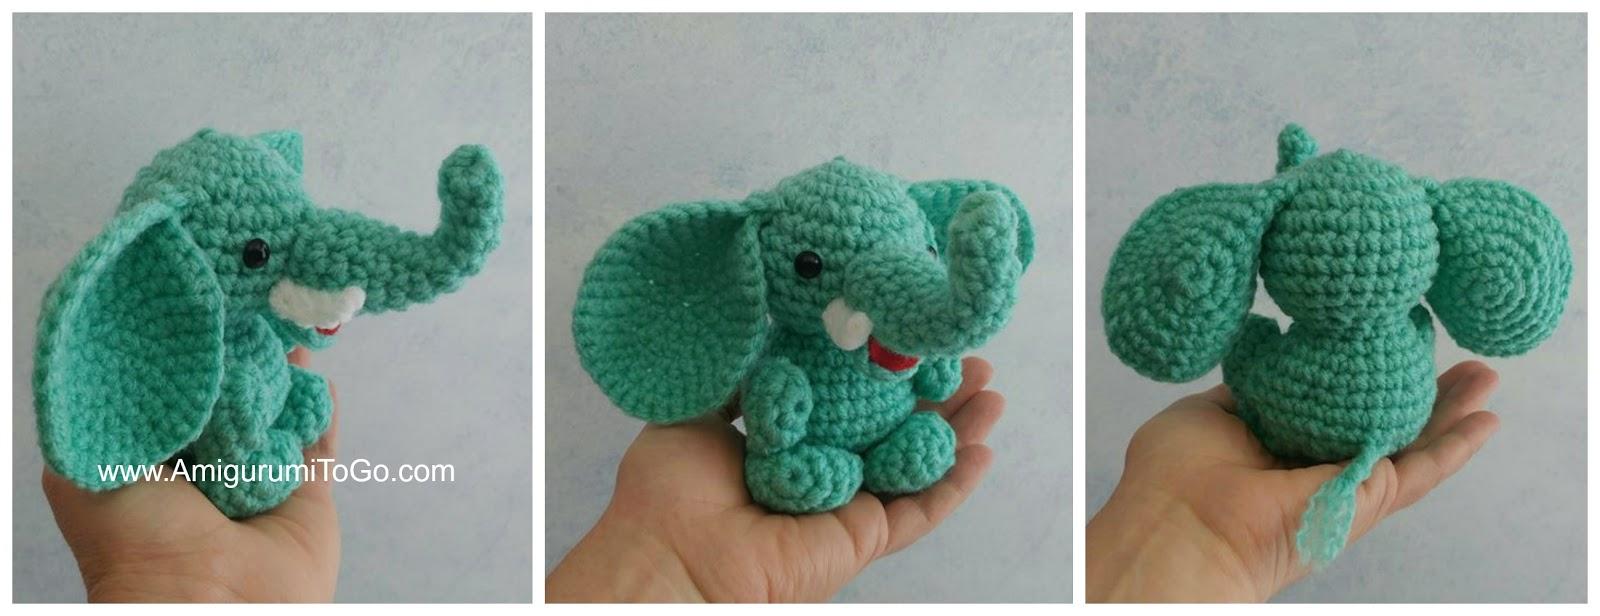 Mini Safari Friends by Amigurumi To Go Free Crochet Patterns Here ...   616x1600